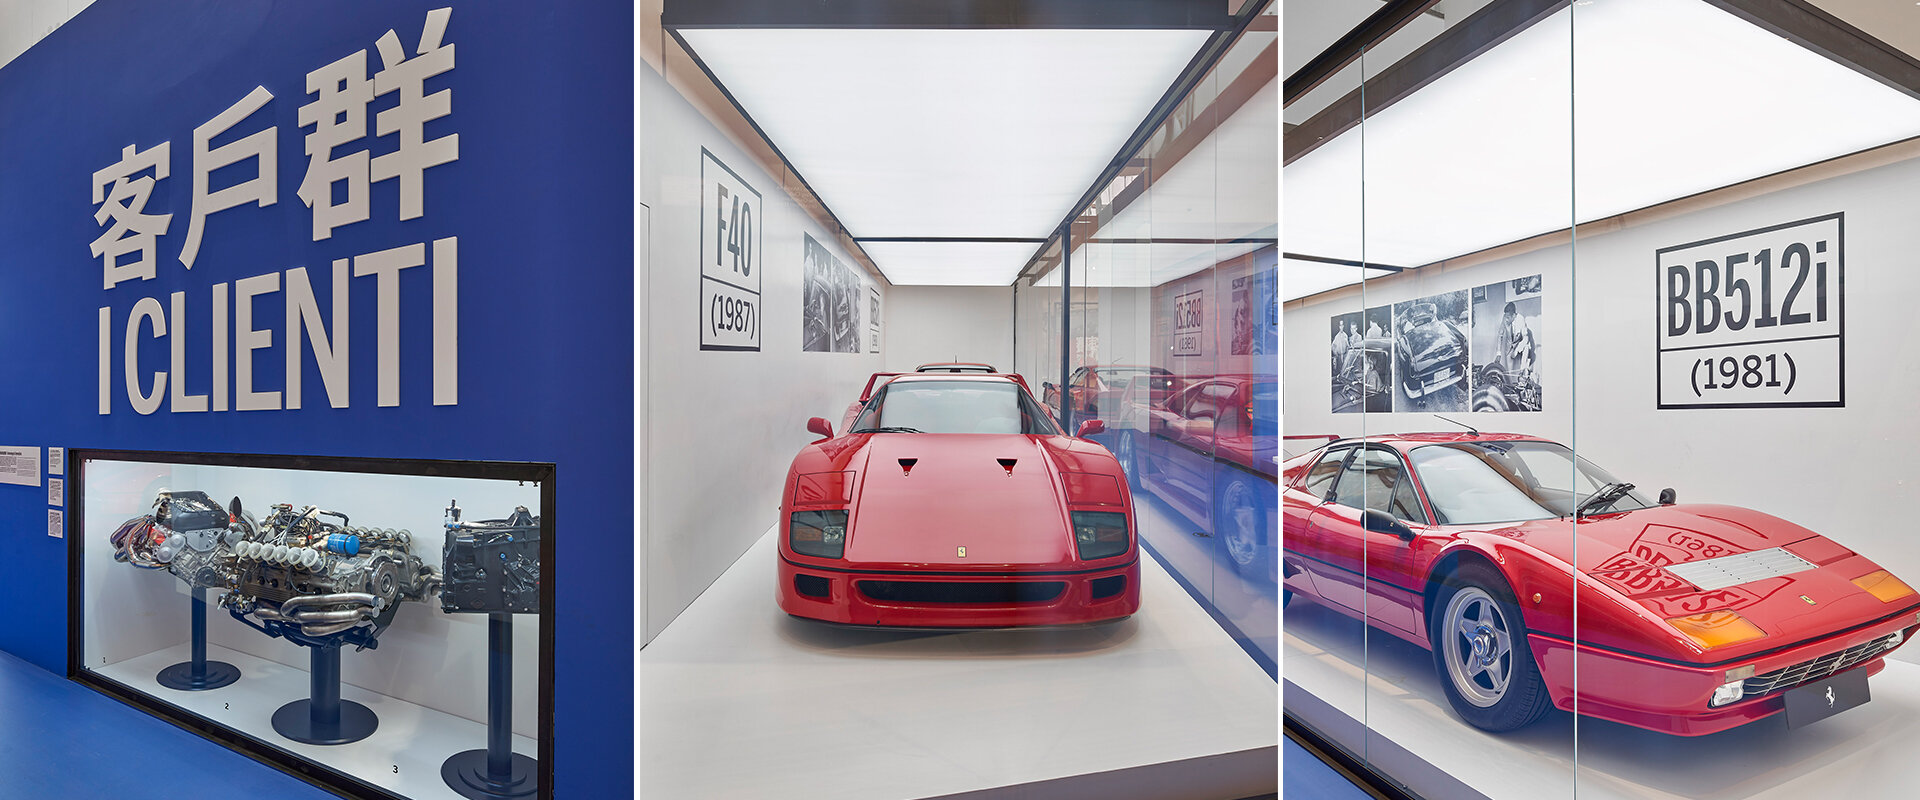 Ferrari 26,27,33.jpg